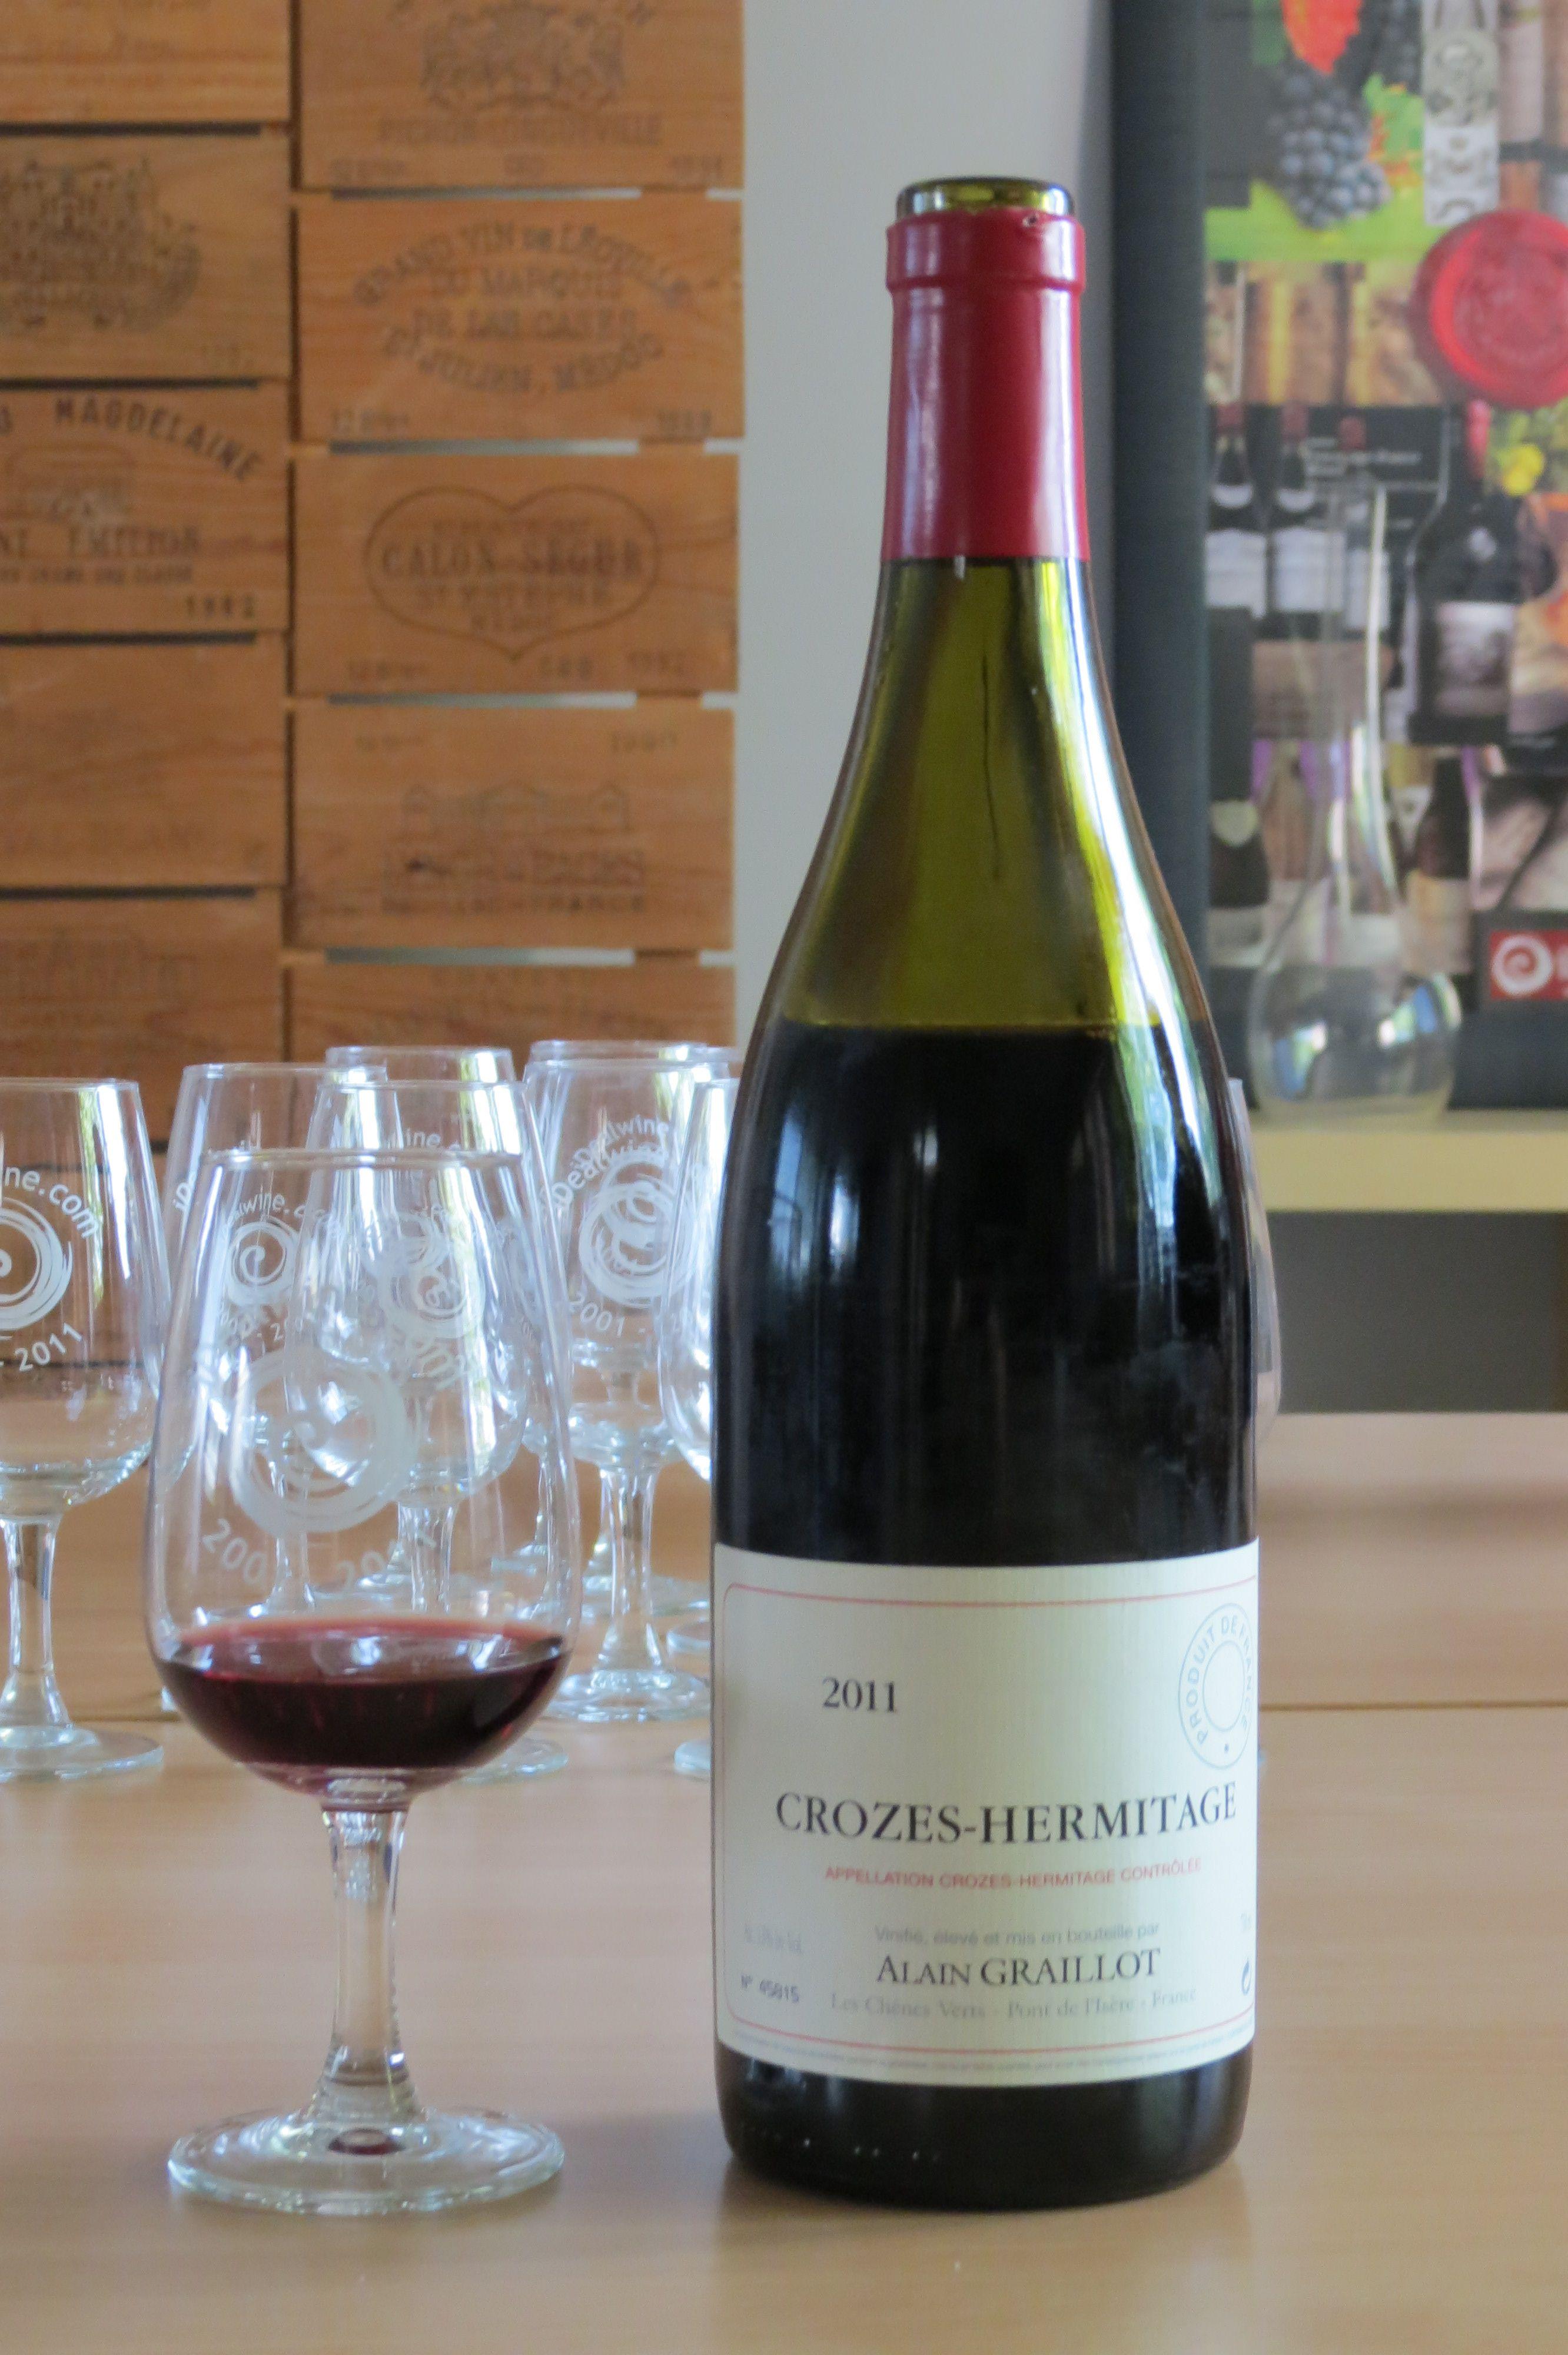 Domaine Alain Graillot Crozes Hermitage 2011 Rouge Http Www Vente Privee Idealwine Com Products Php Ref 221 04 Idealwine Cave A Vin Cepages Bonnes Choses